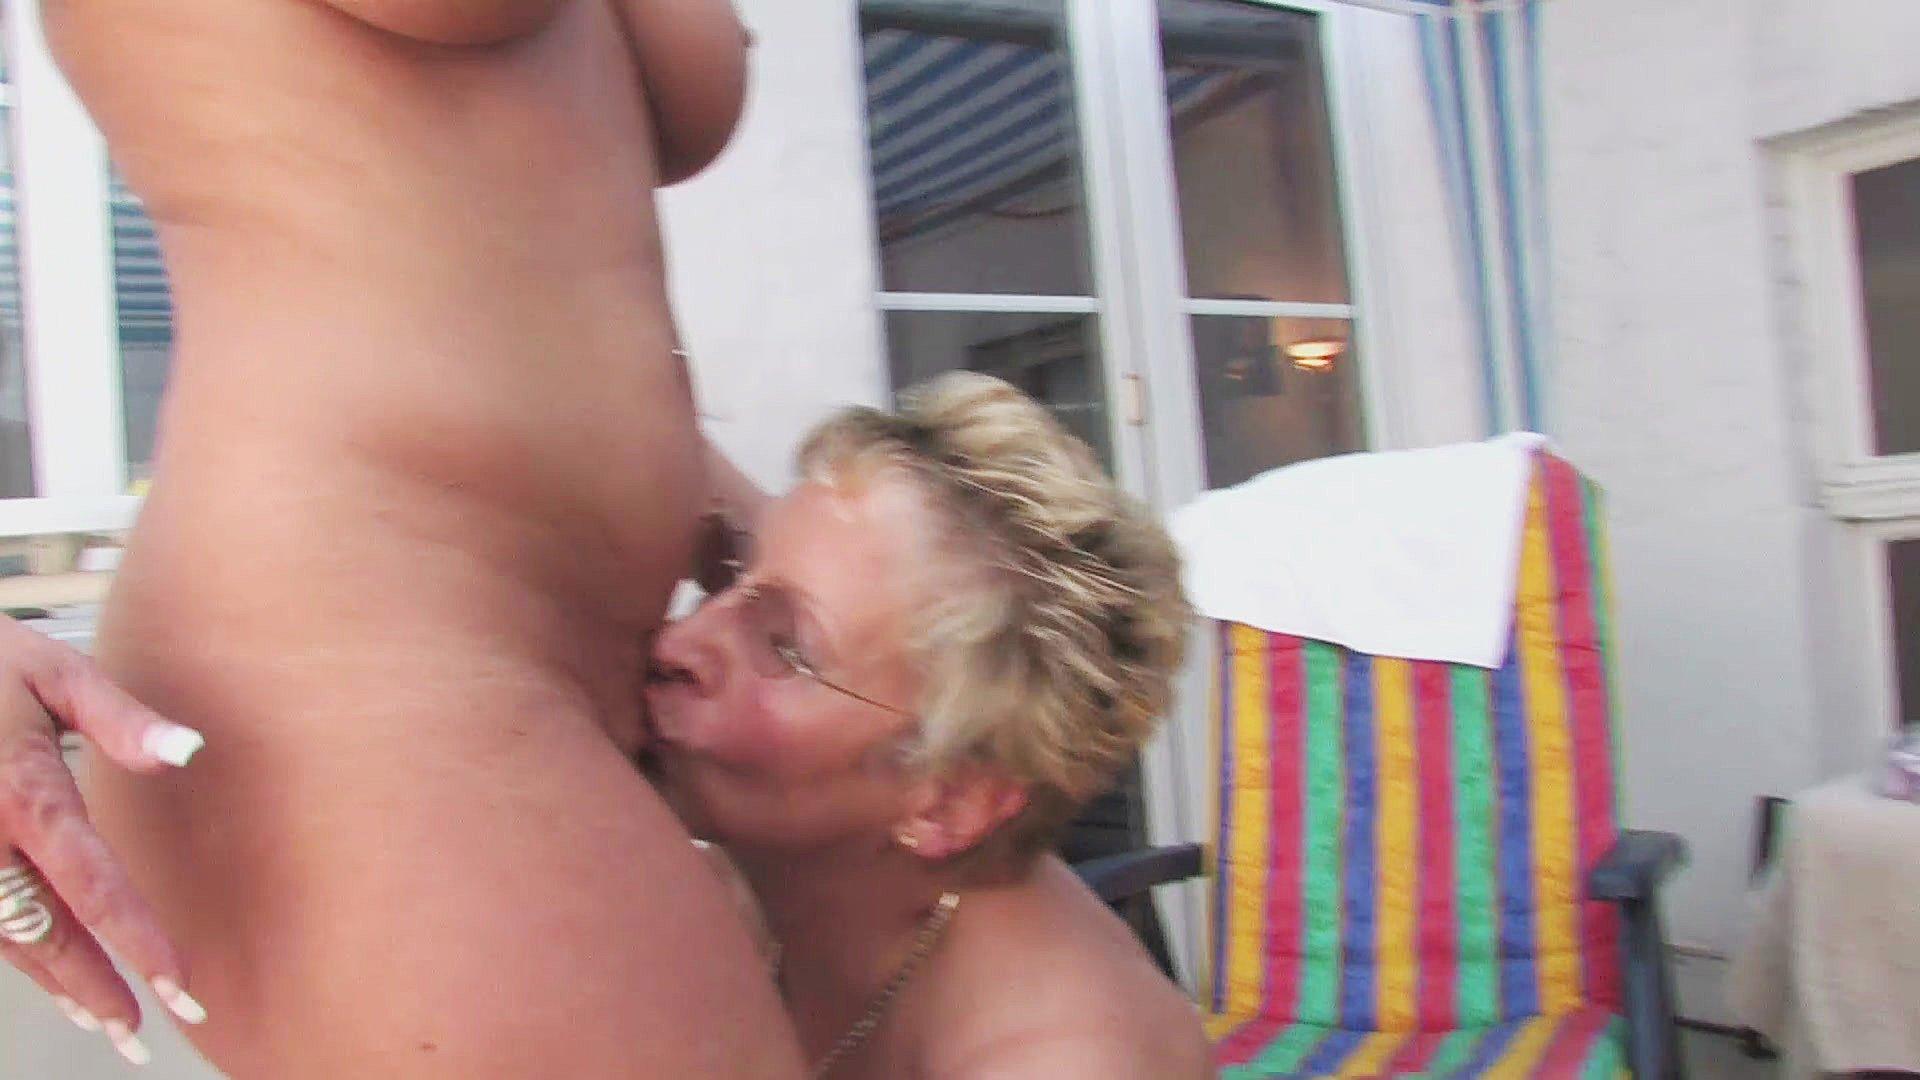 Kinkaid recommends Desi nude avi clip